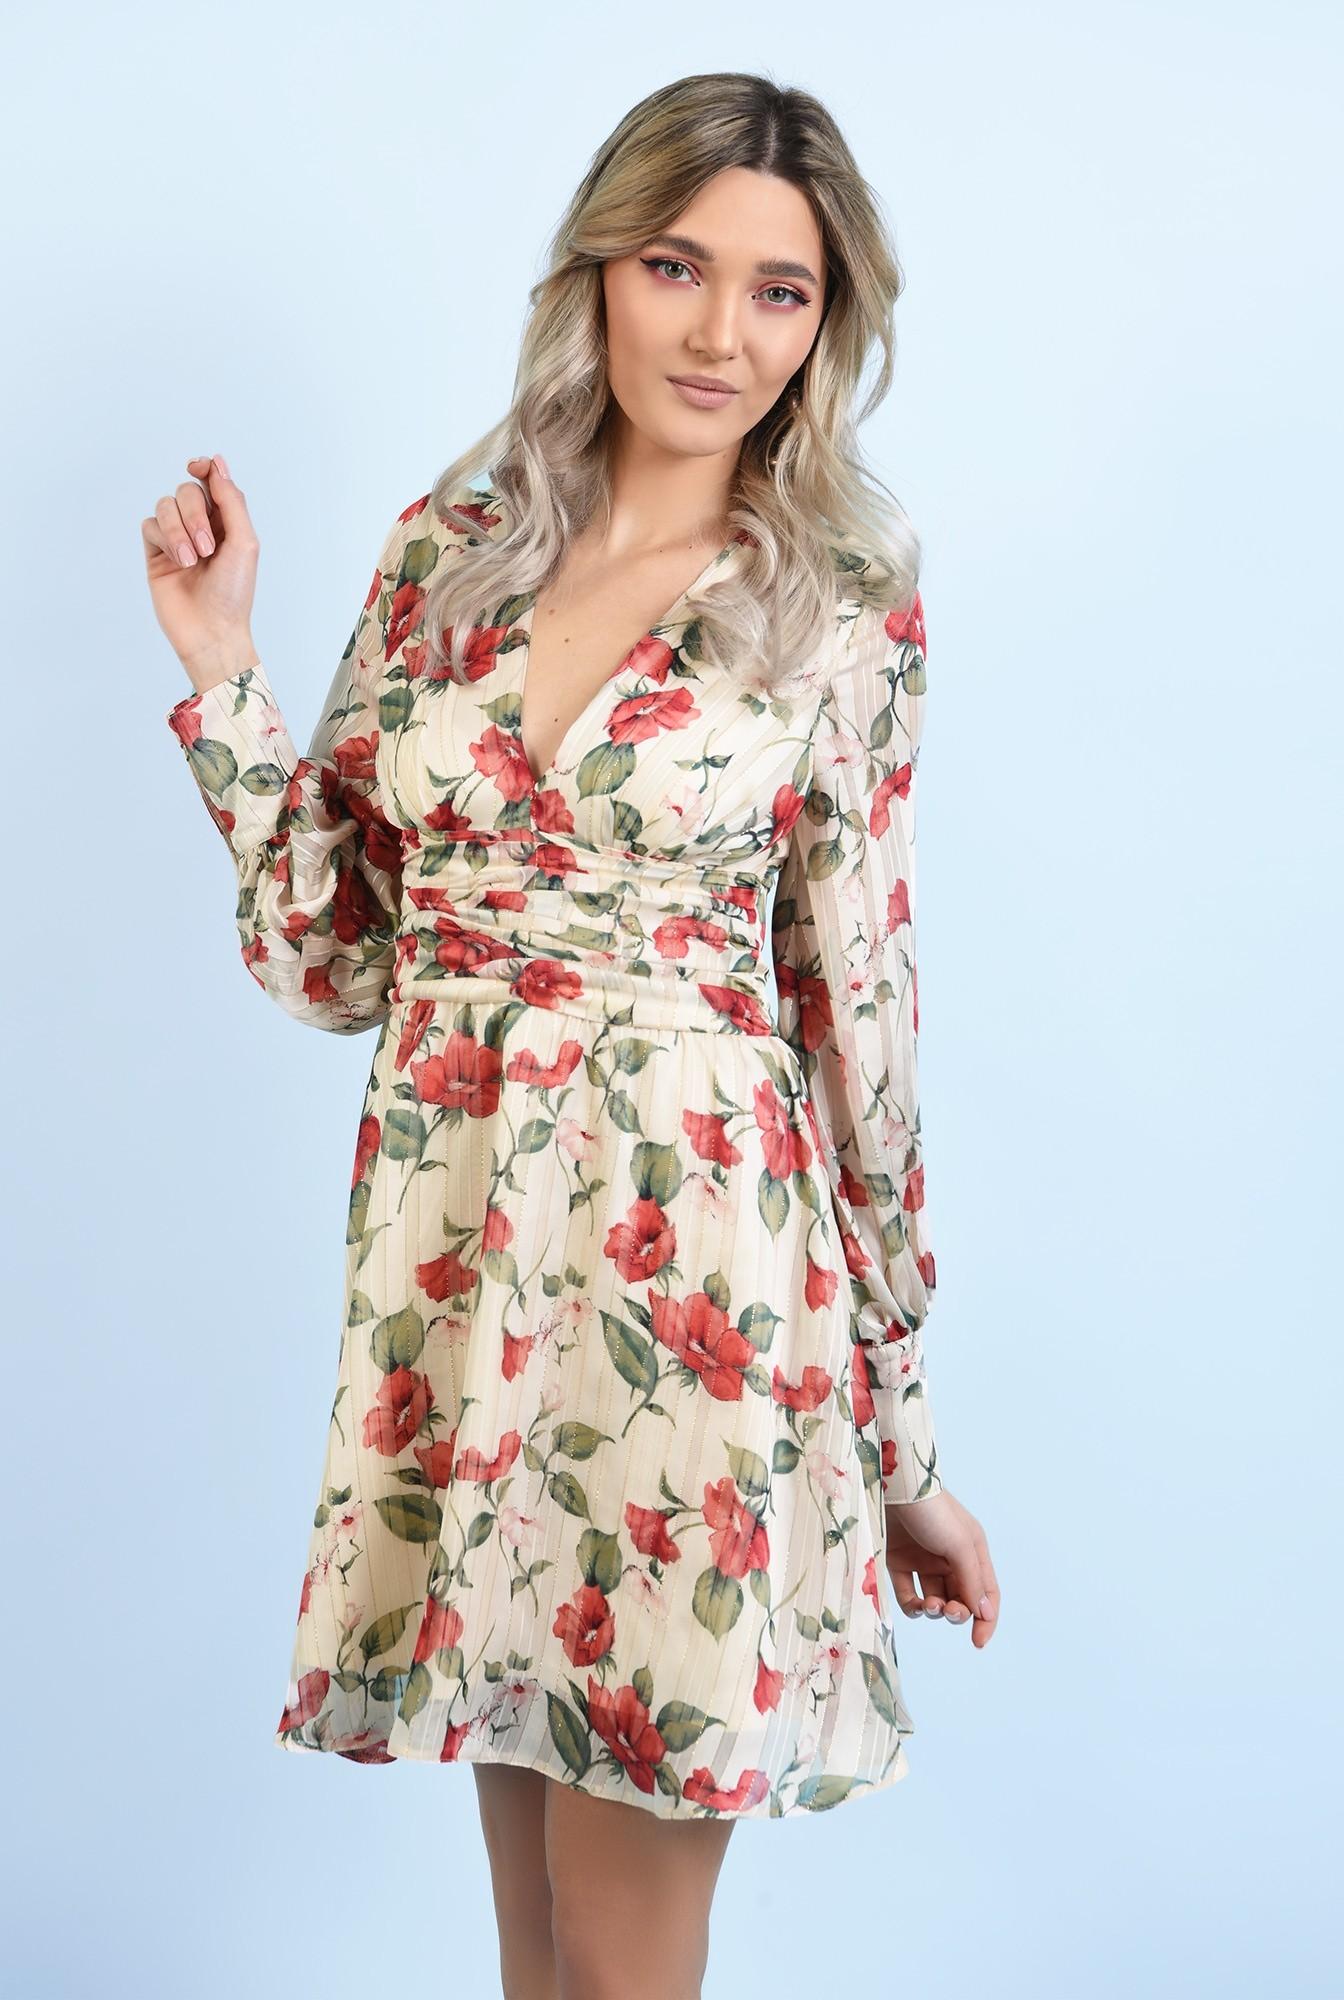 2 - rochie mini, din sifon, cu flori, maneci lungi, betelie fronsata